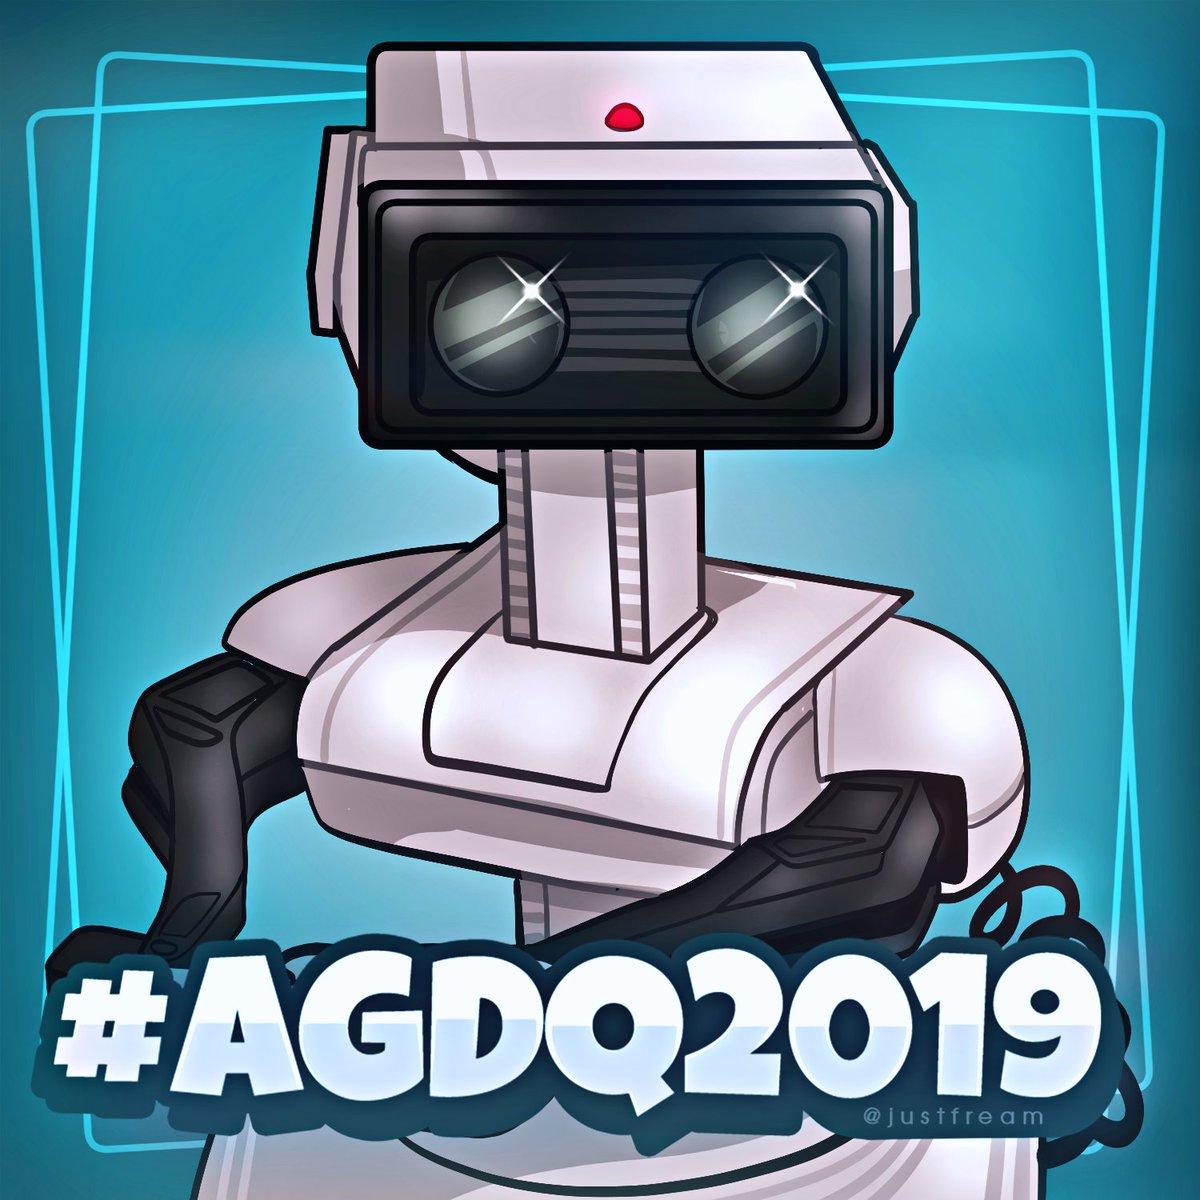 ALL HAIL TASBOT! | #AGDQ2019  #GamesDrawnQuick @GamesDoneQuick<br>http://pic.twitter.com/zQALxHCPfI